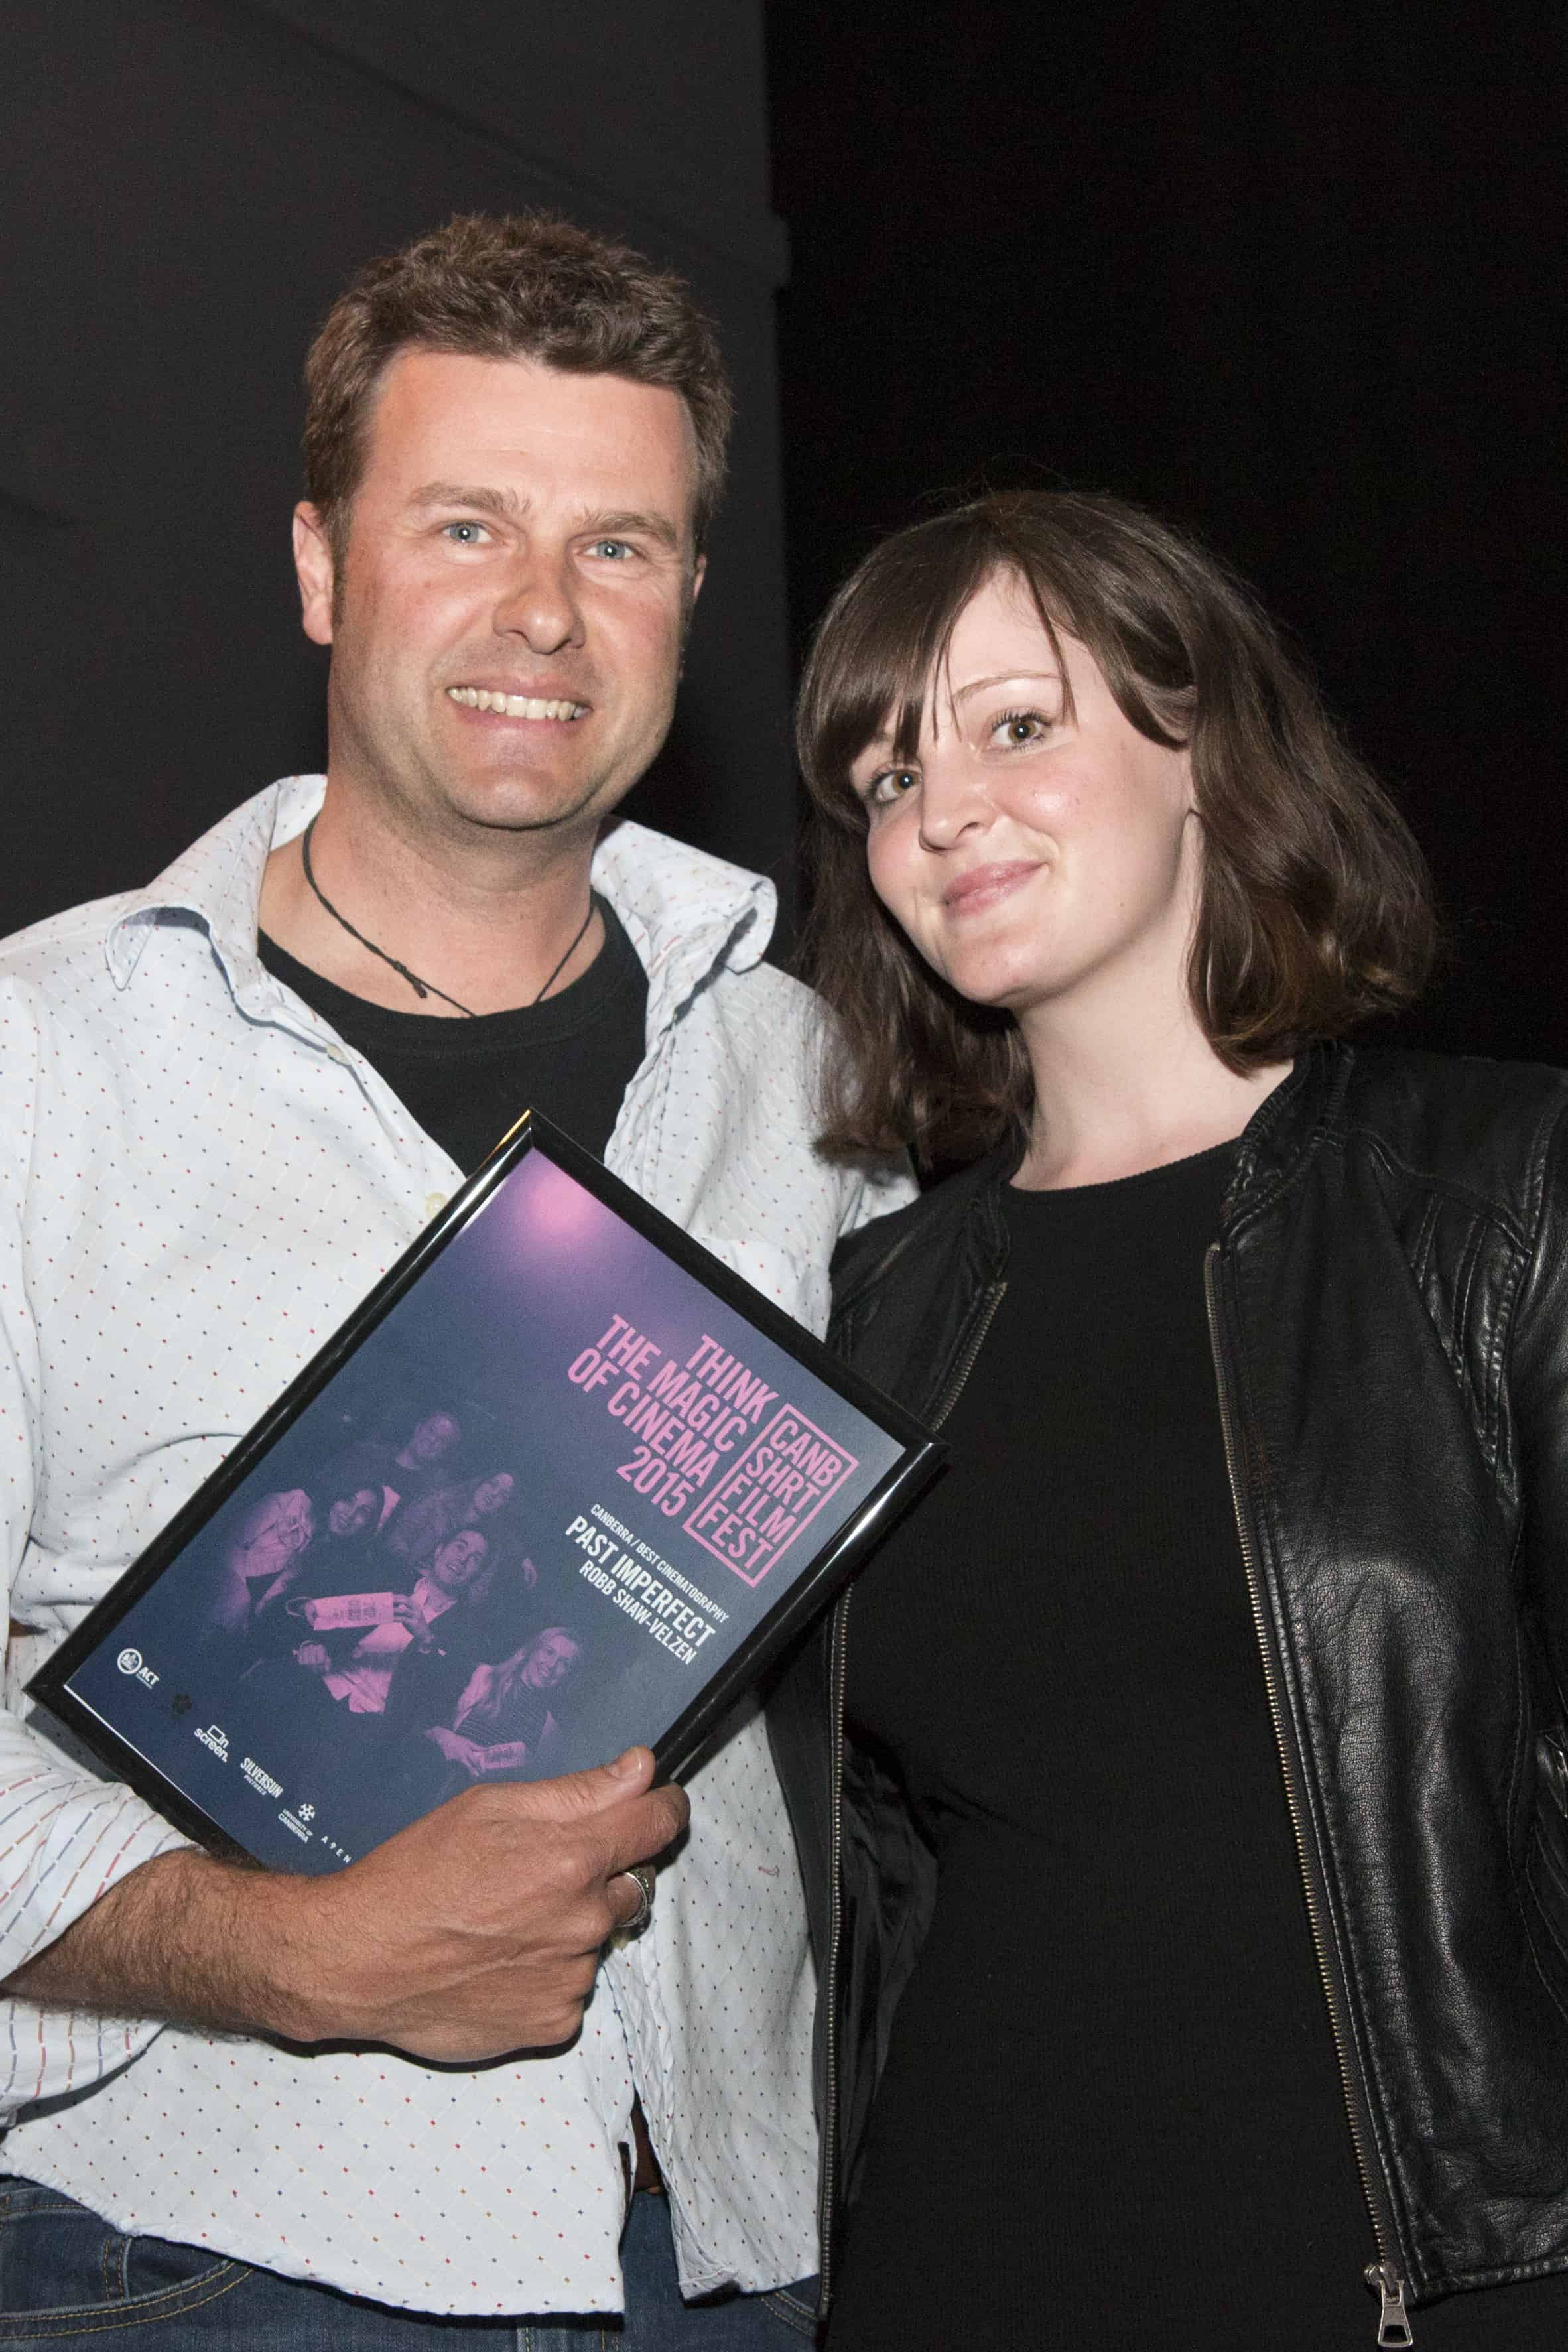 Robb Shaw-Velzen and Laura White